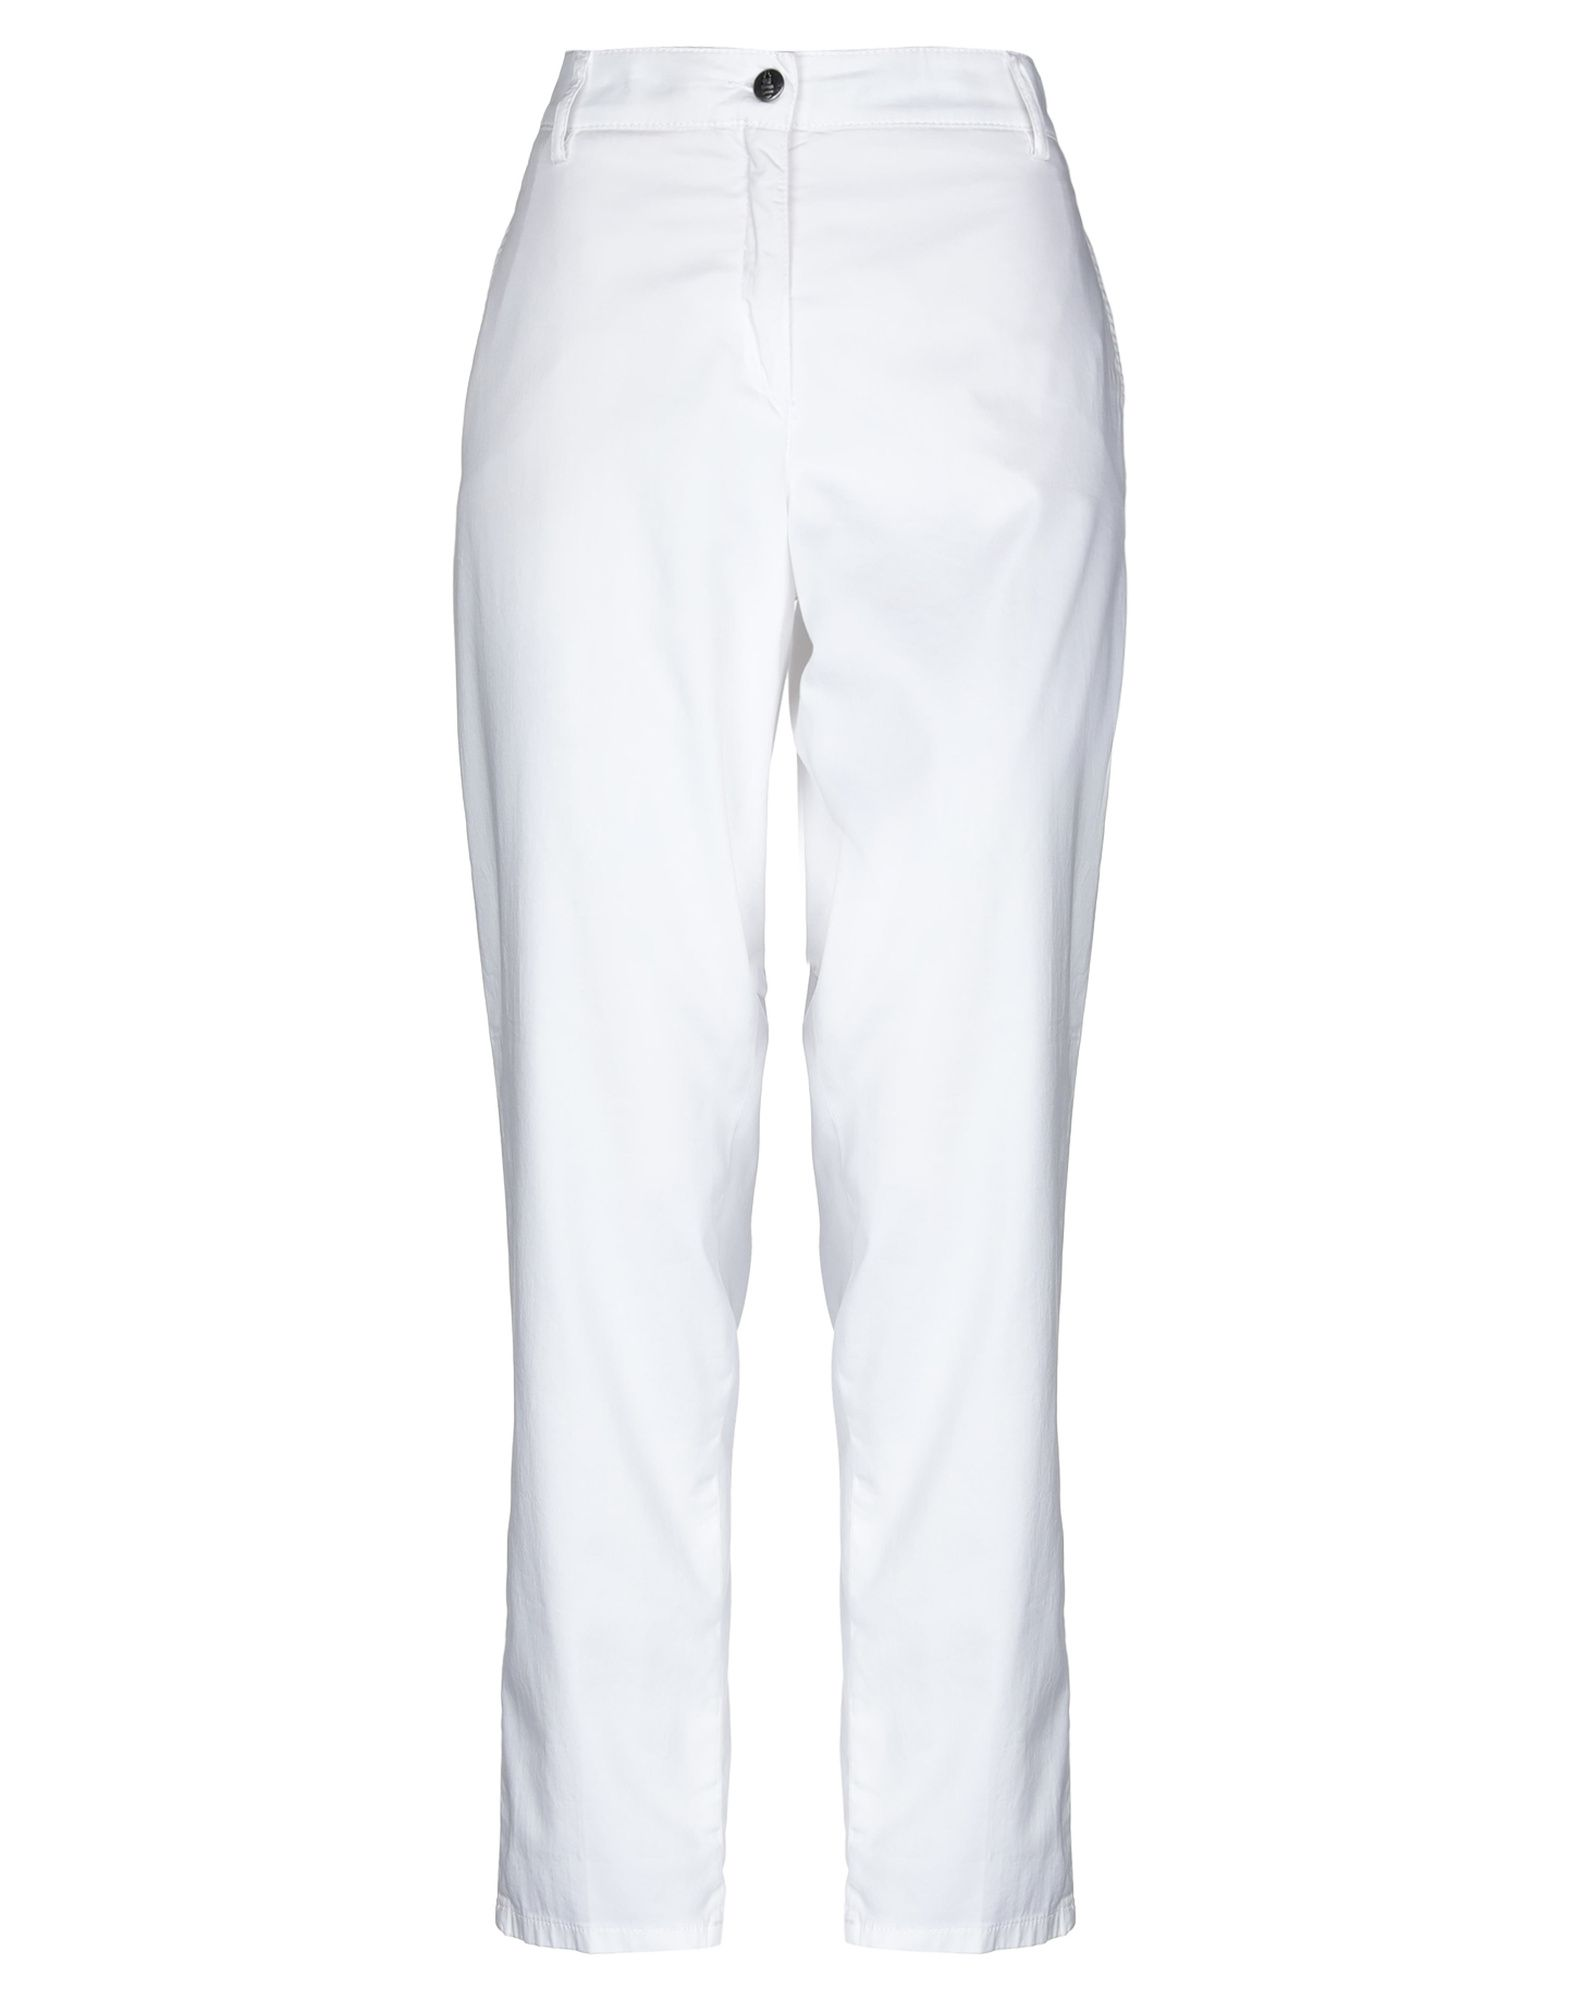 IRIS VON ARNIM Повседневные брюки iris von arnim воротник